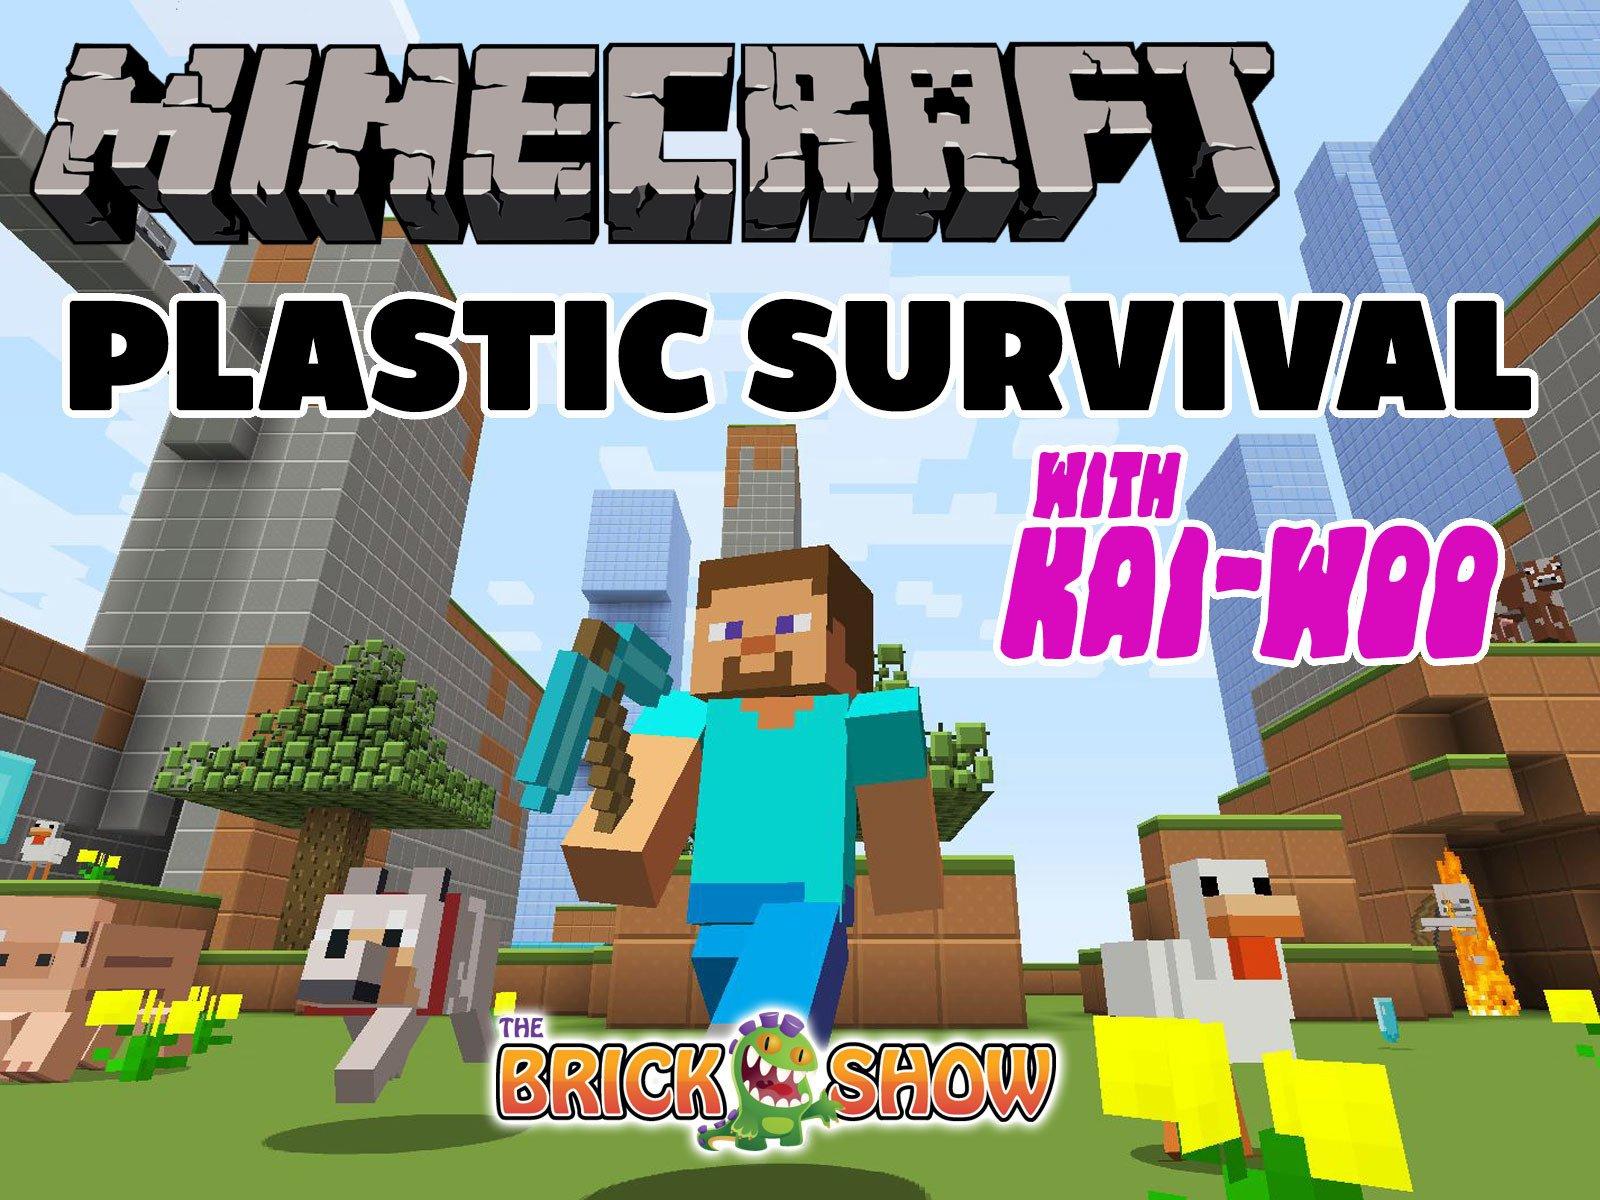 Clip: Minecraft Plastic Survival with Kai-Woo - Season 1